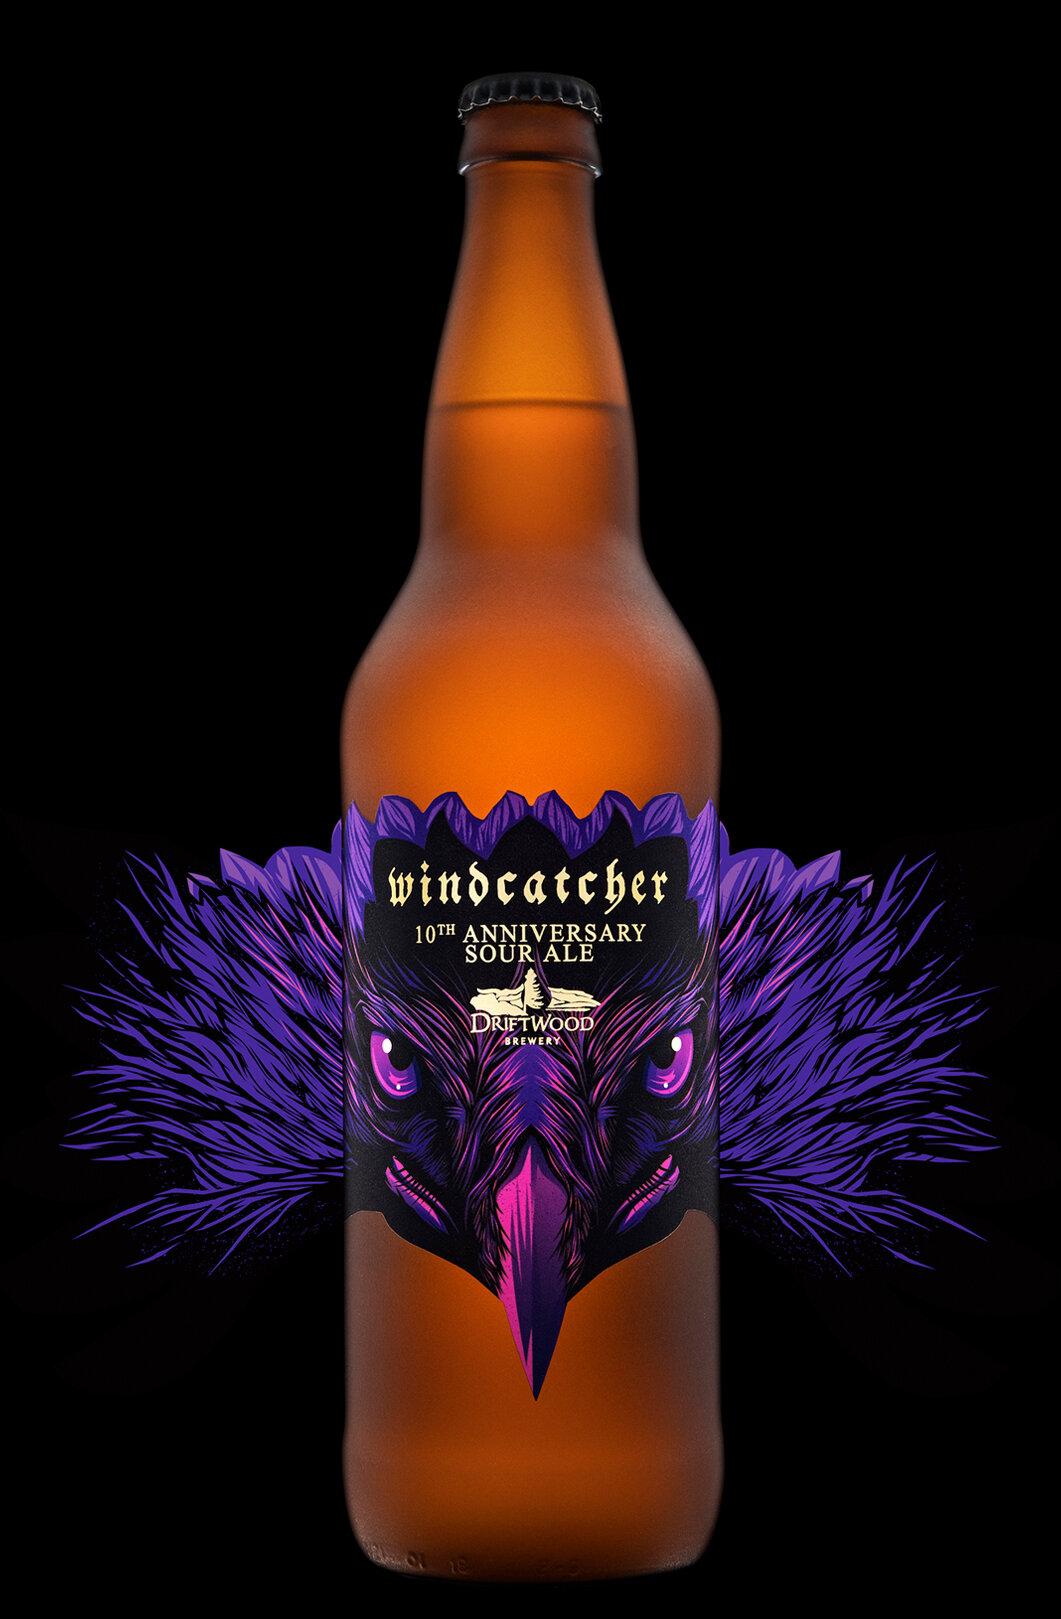 Windcatcher 10th Anniversary Sour Ale